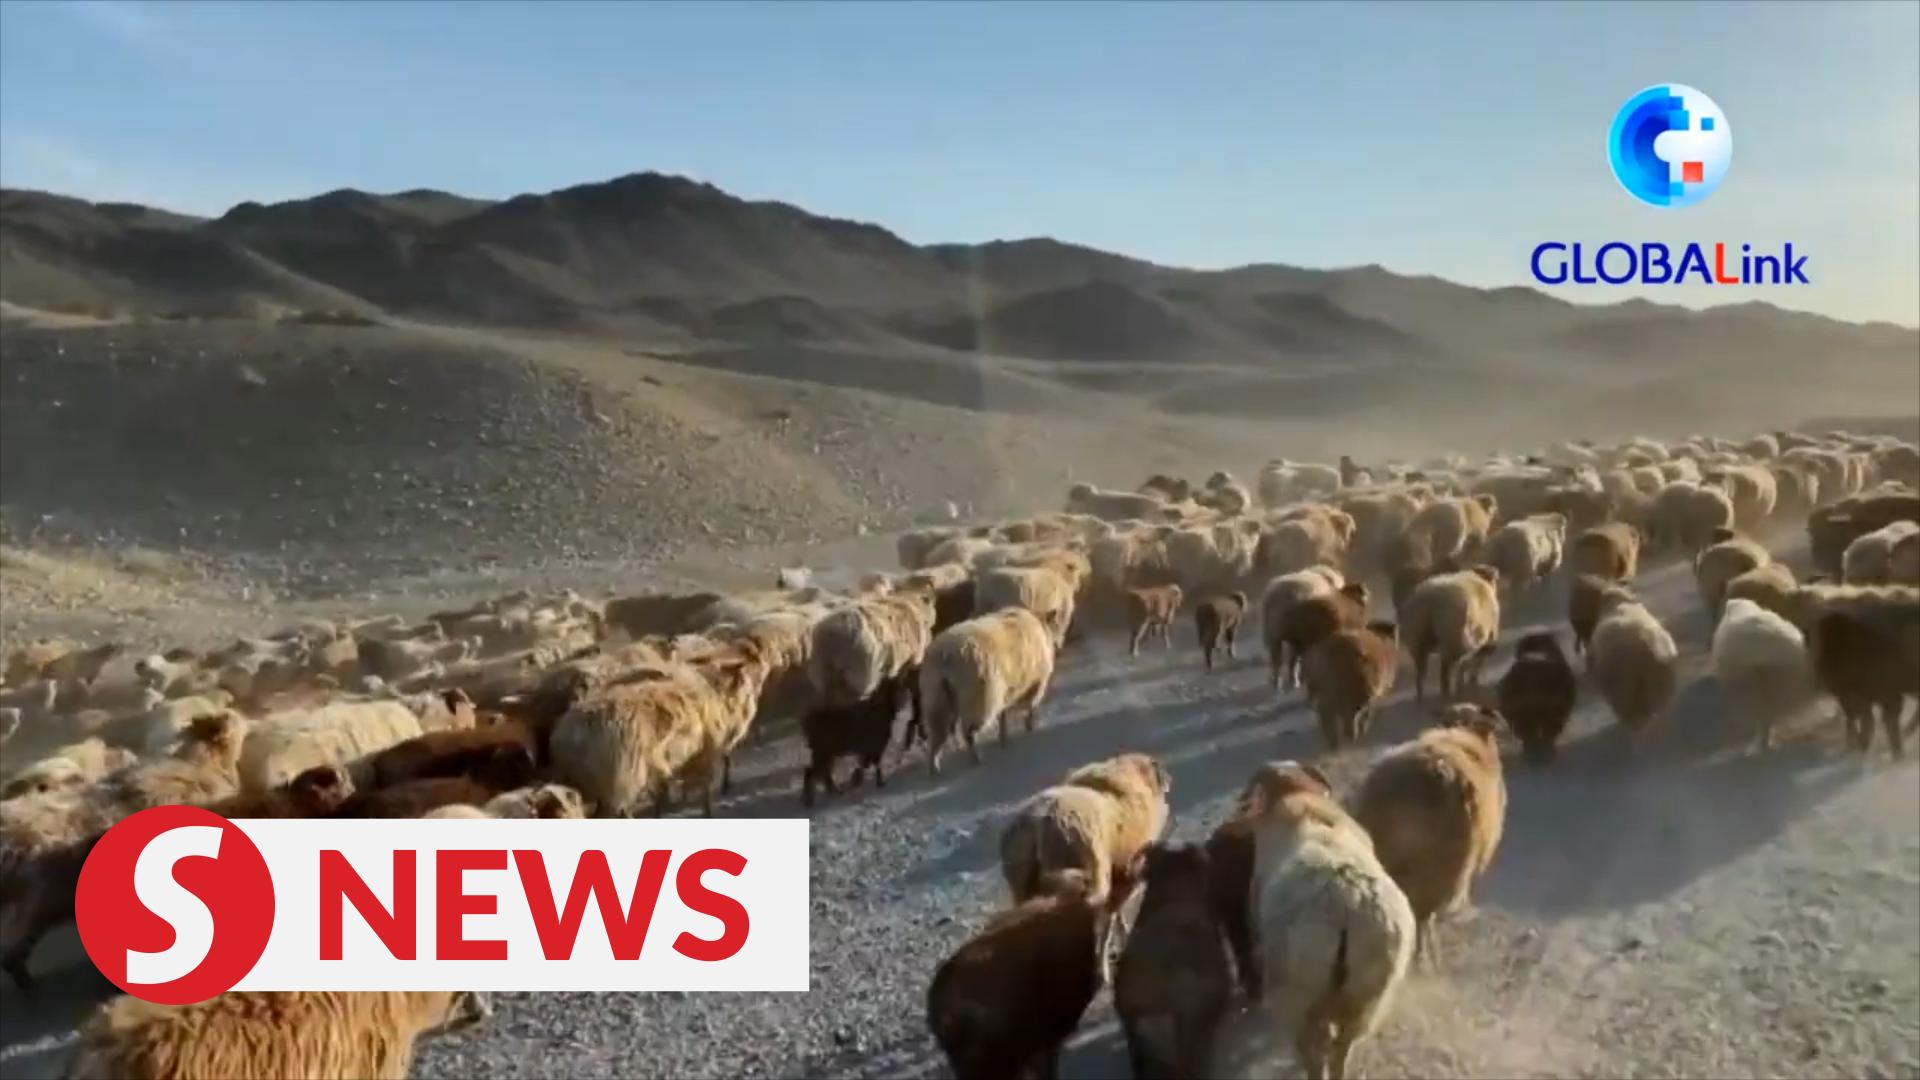 Xinjiang herders begin transferring livestock to spring pastures